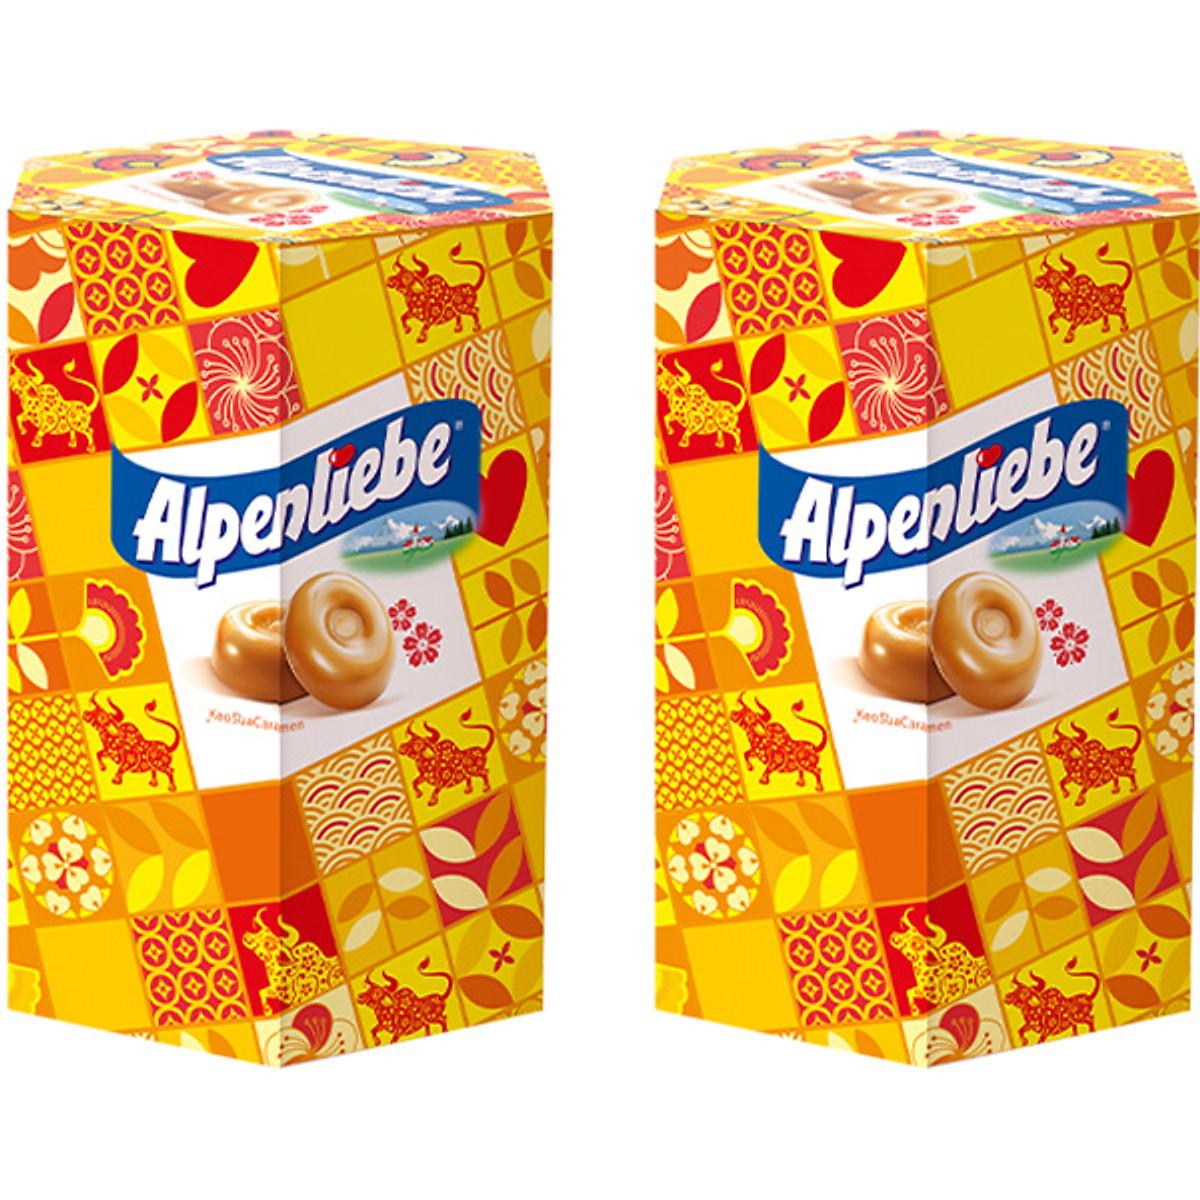 Combo 2 Hộp Kẹo Tết Alpenliebe Sữa Caramel (Hộp 40 viên)